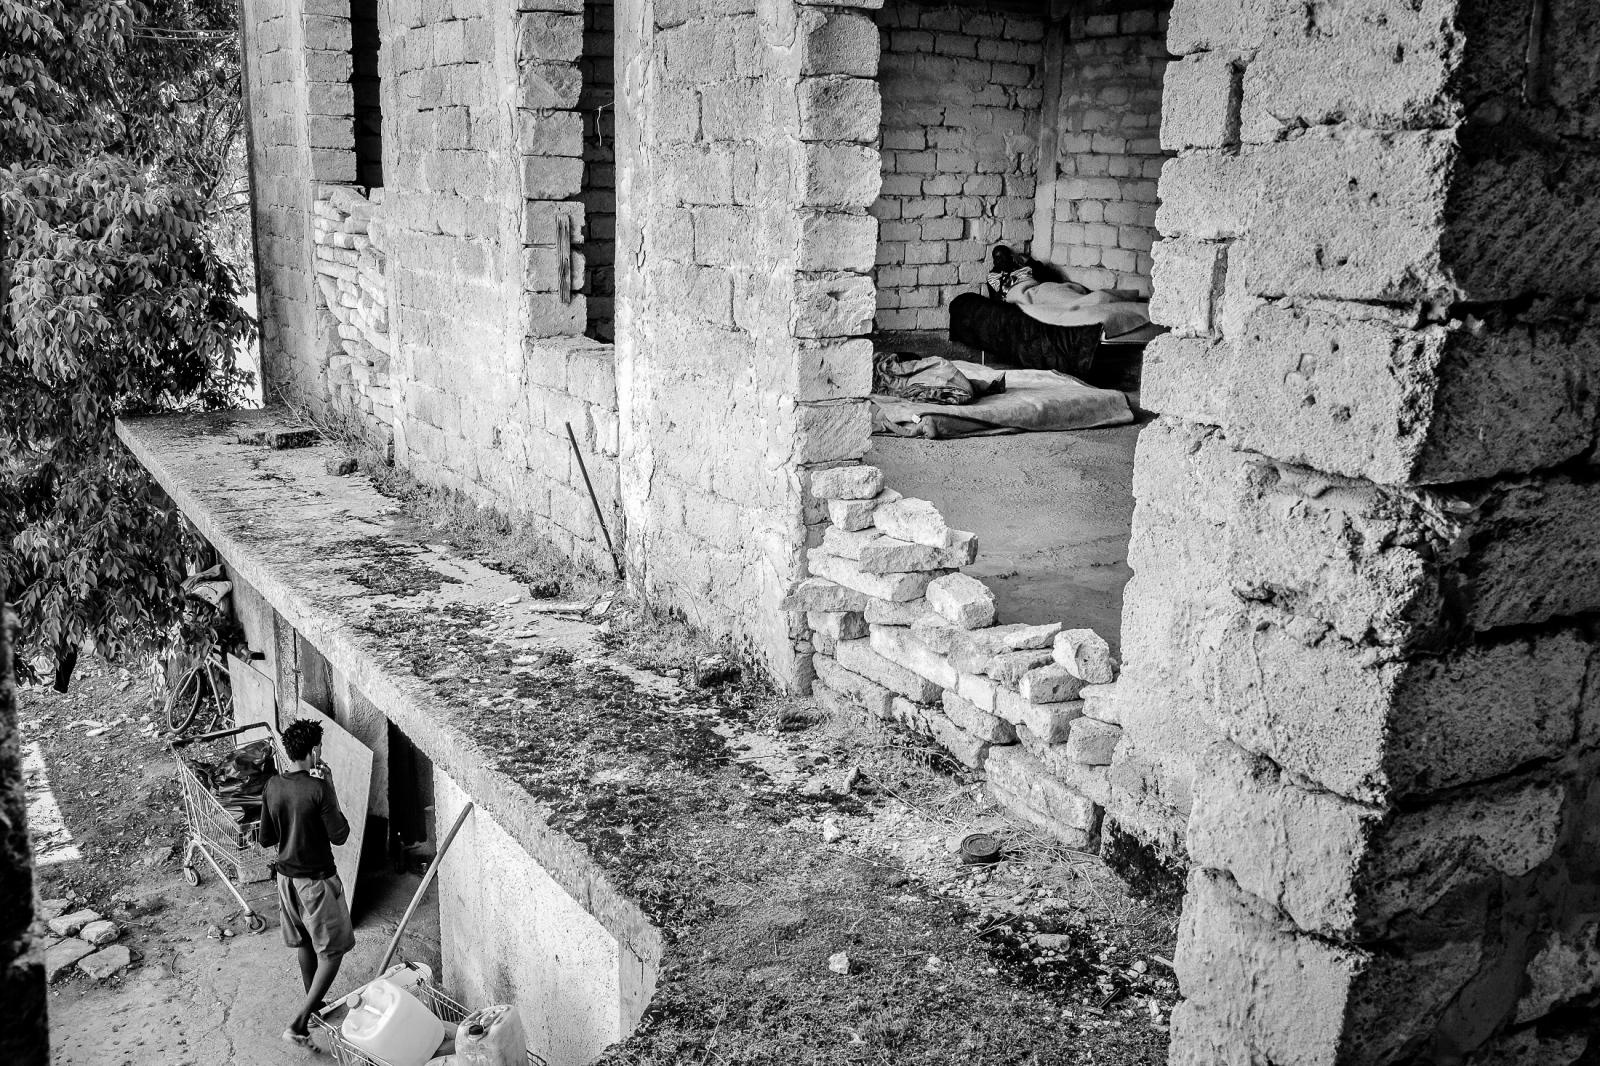 Photography image - Loading Sicily_Farm_workers_M.Smiejek_20180511_7547.jpg